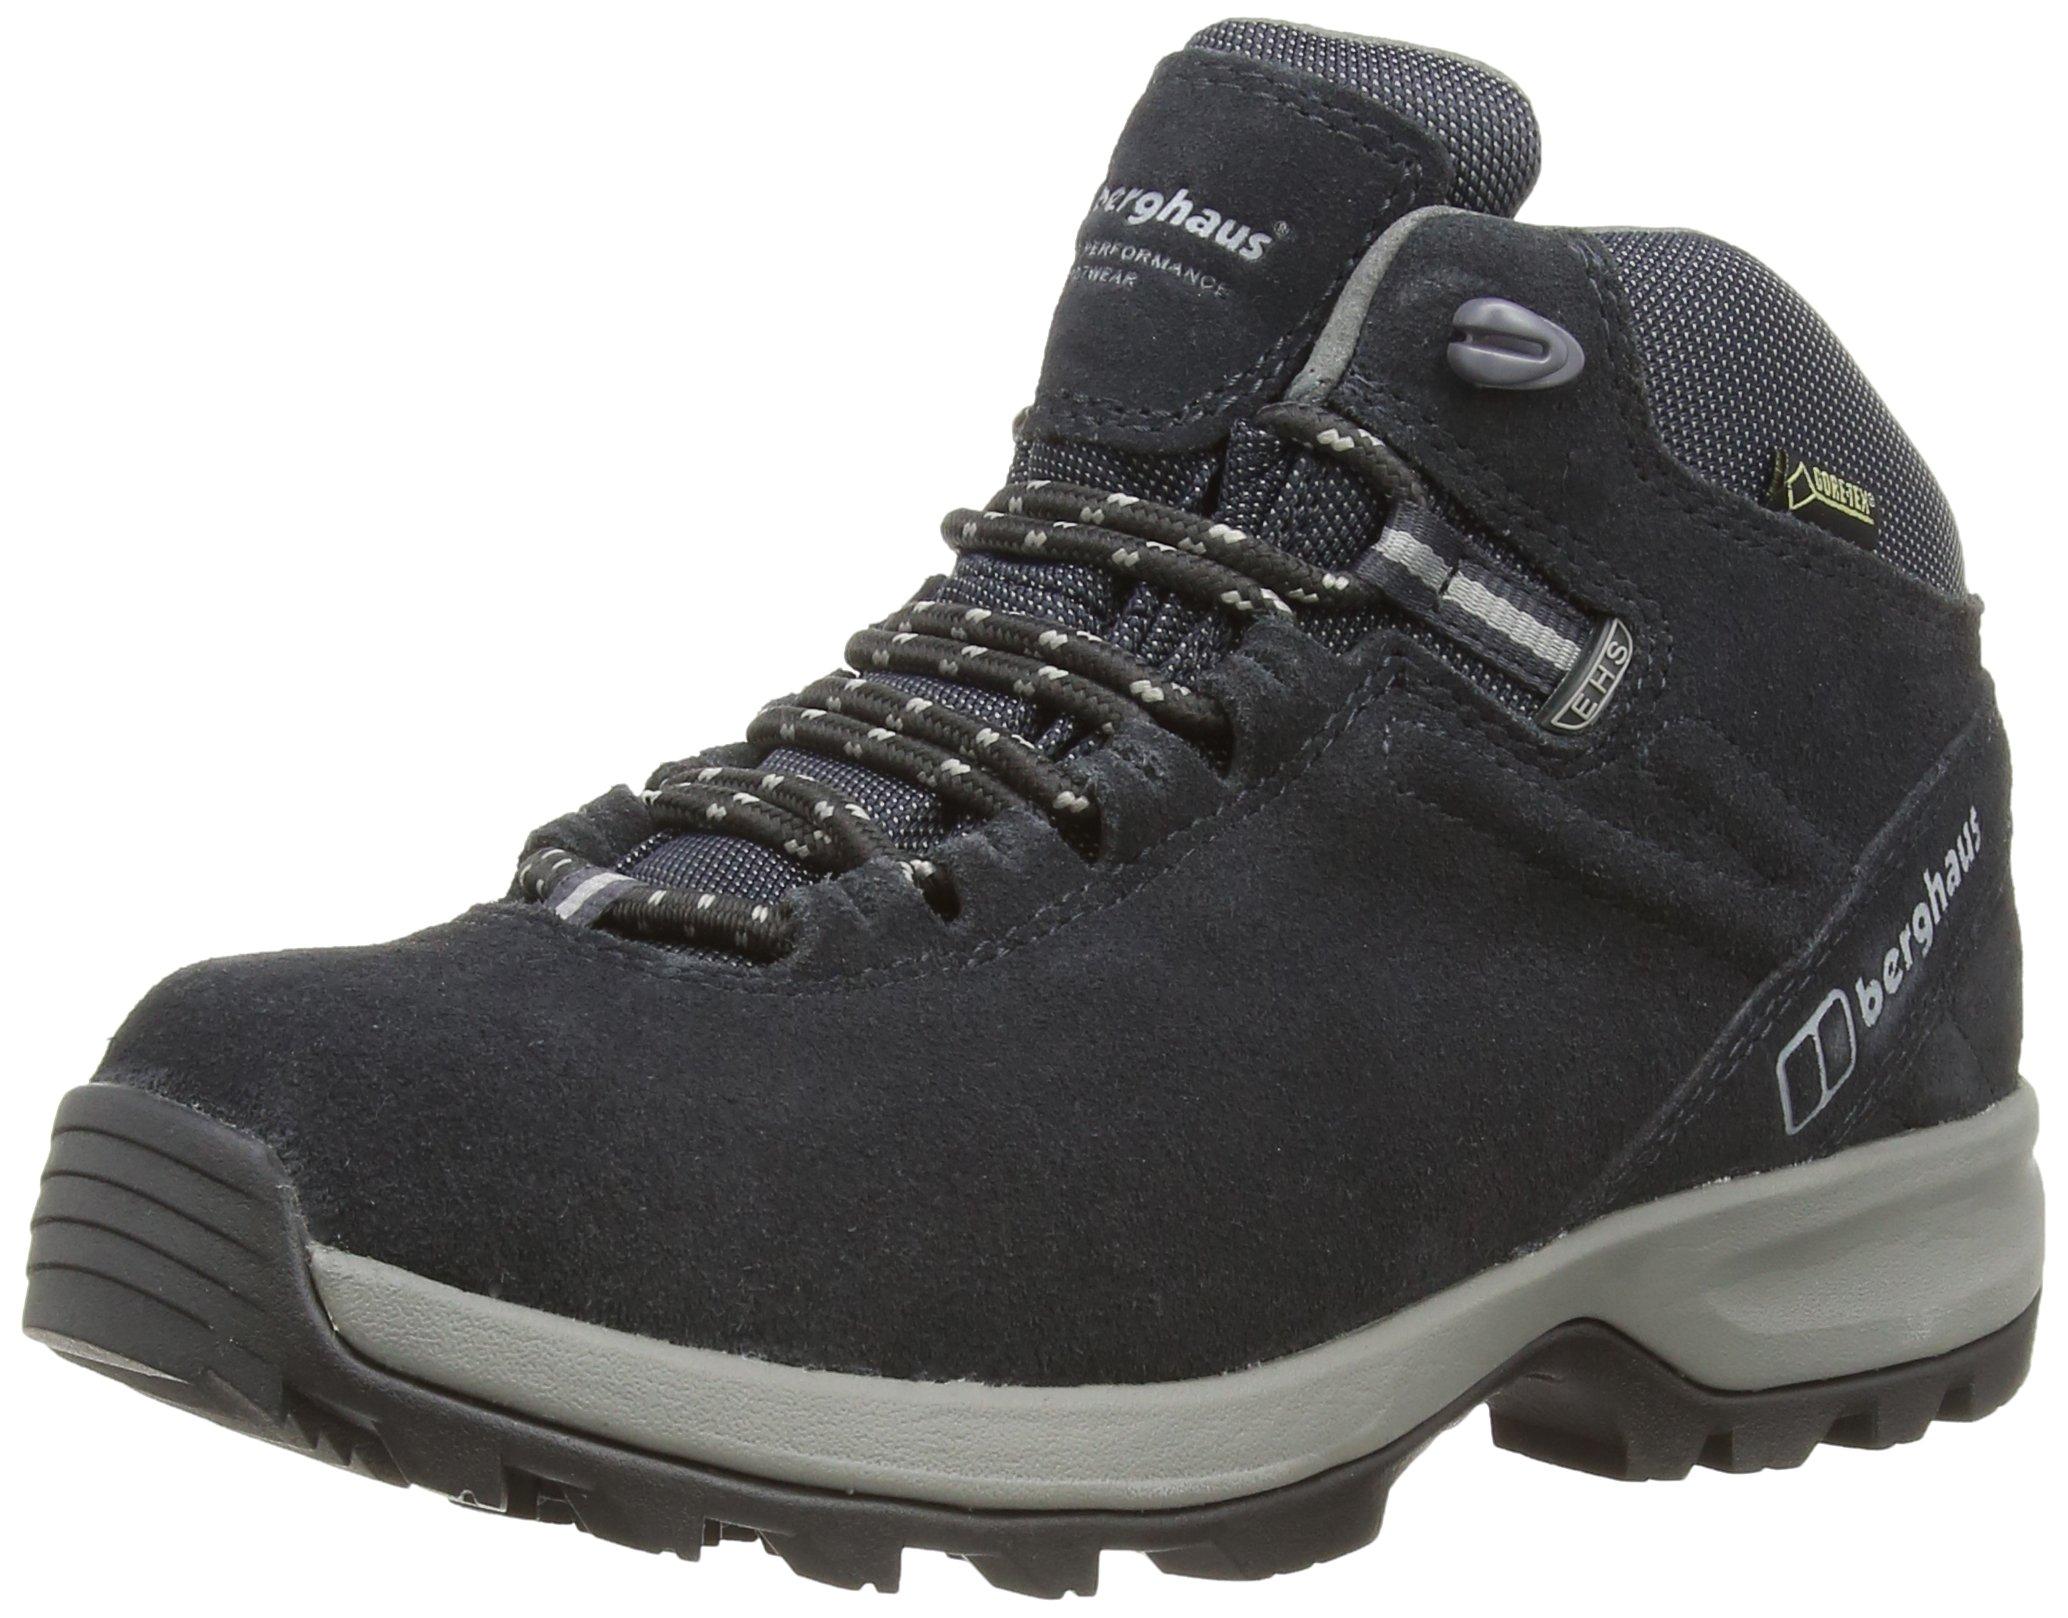 Berghaus Women's Explorer Trail Plus GTX Walking Boots 1